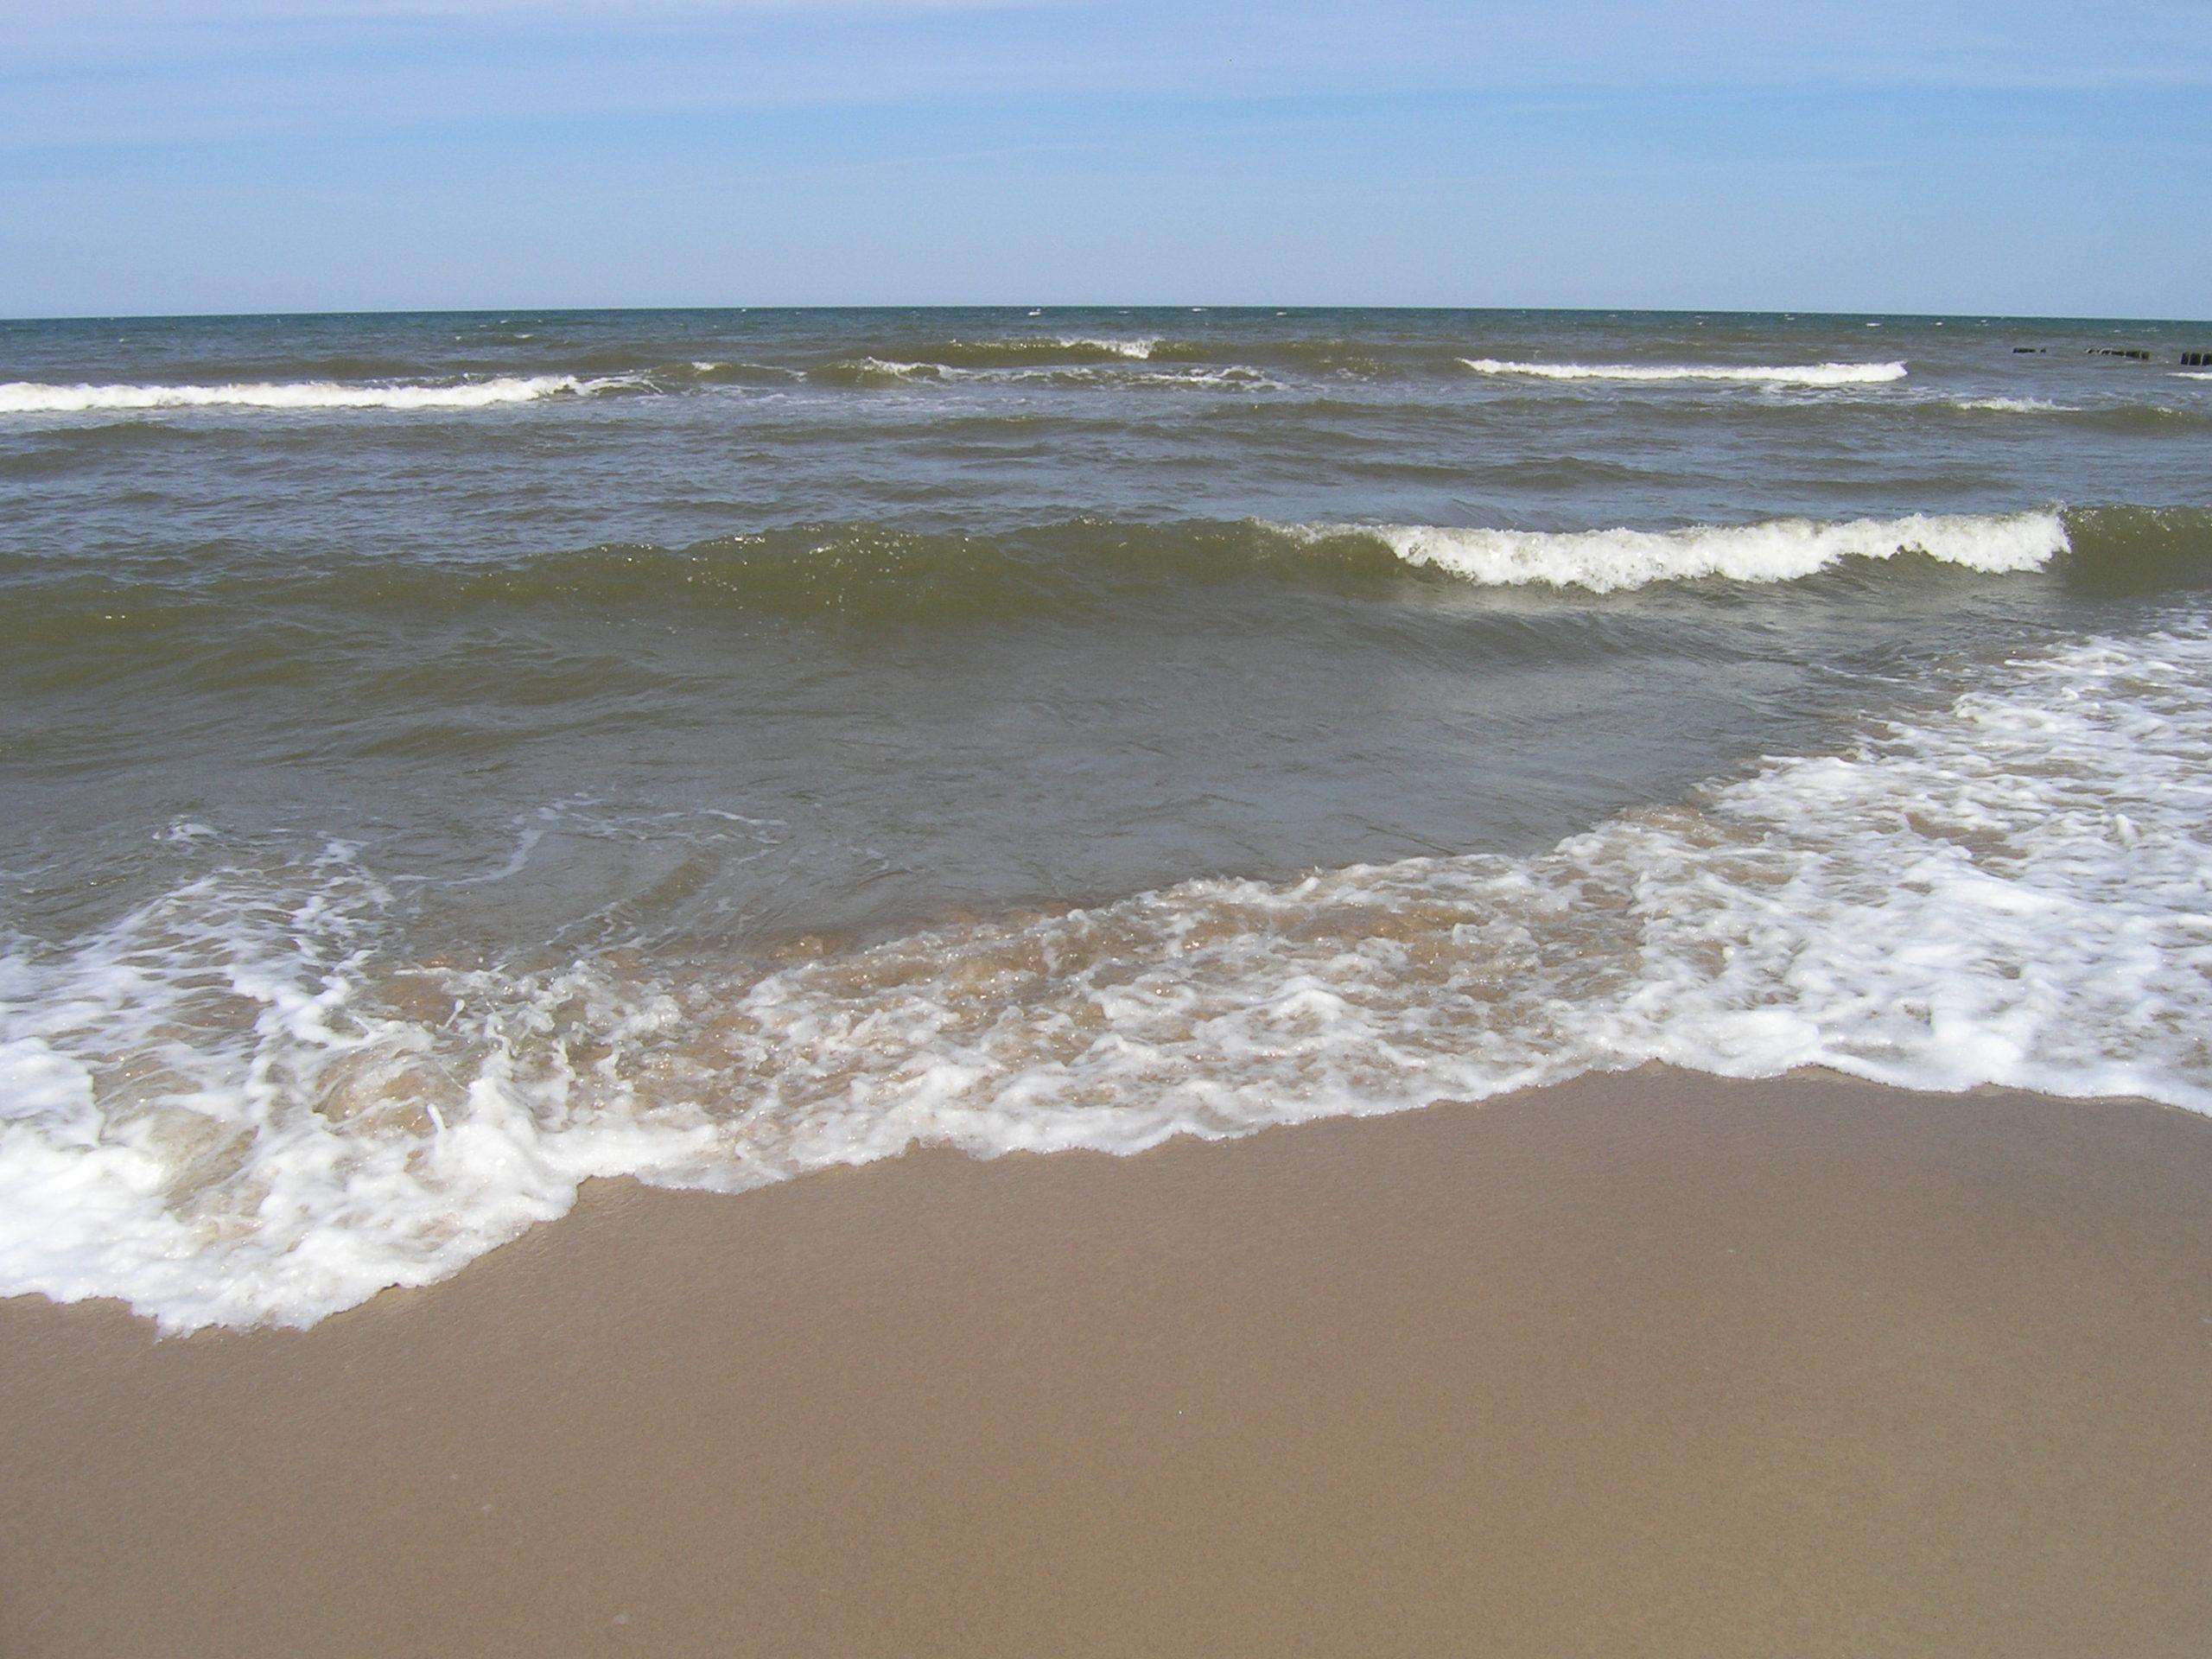 wisełka widok na morze